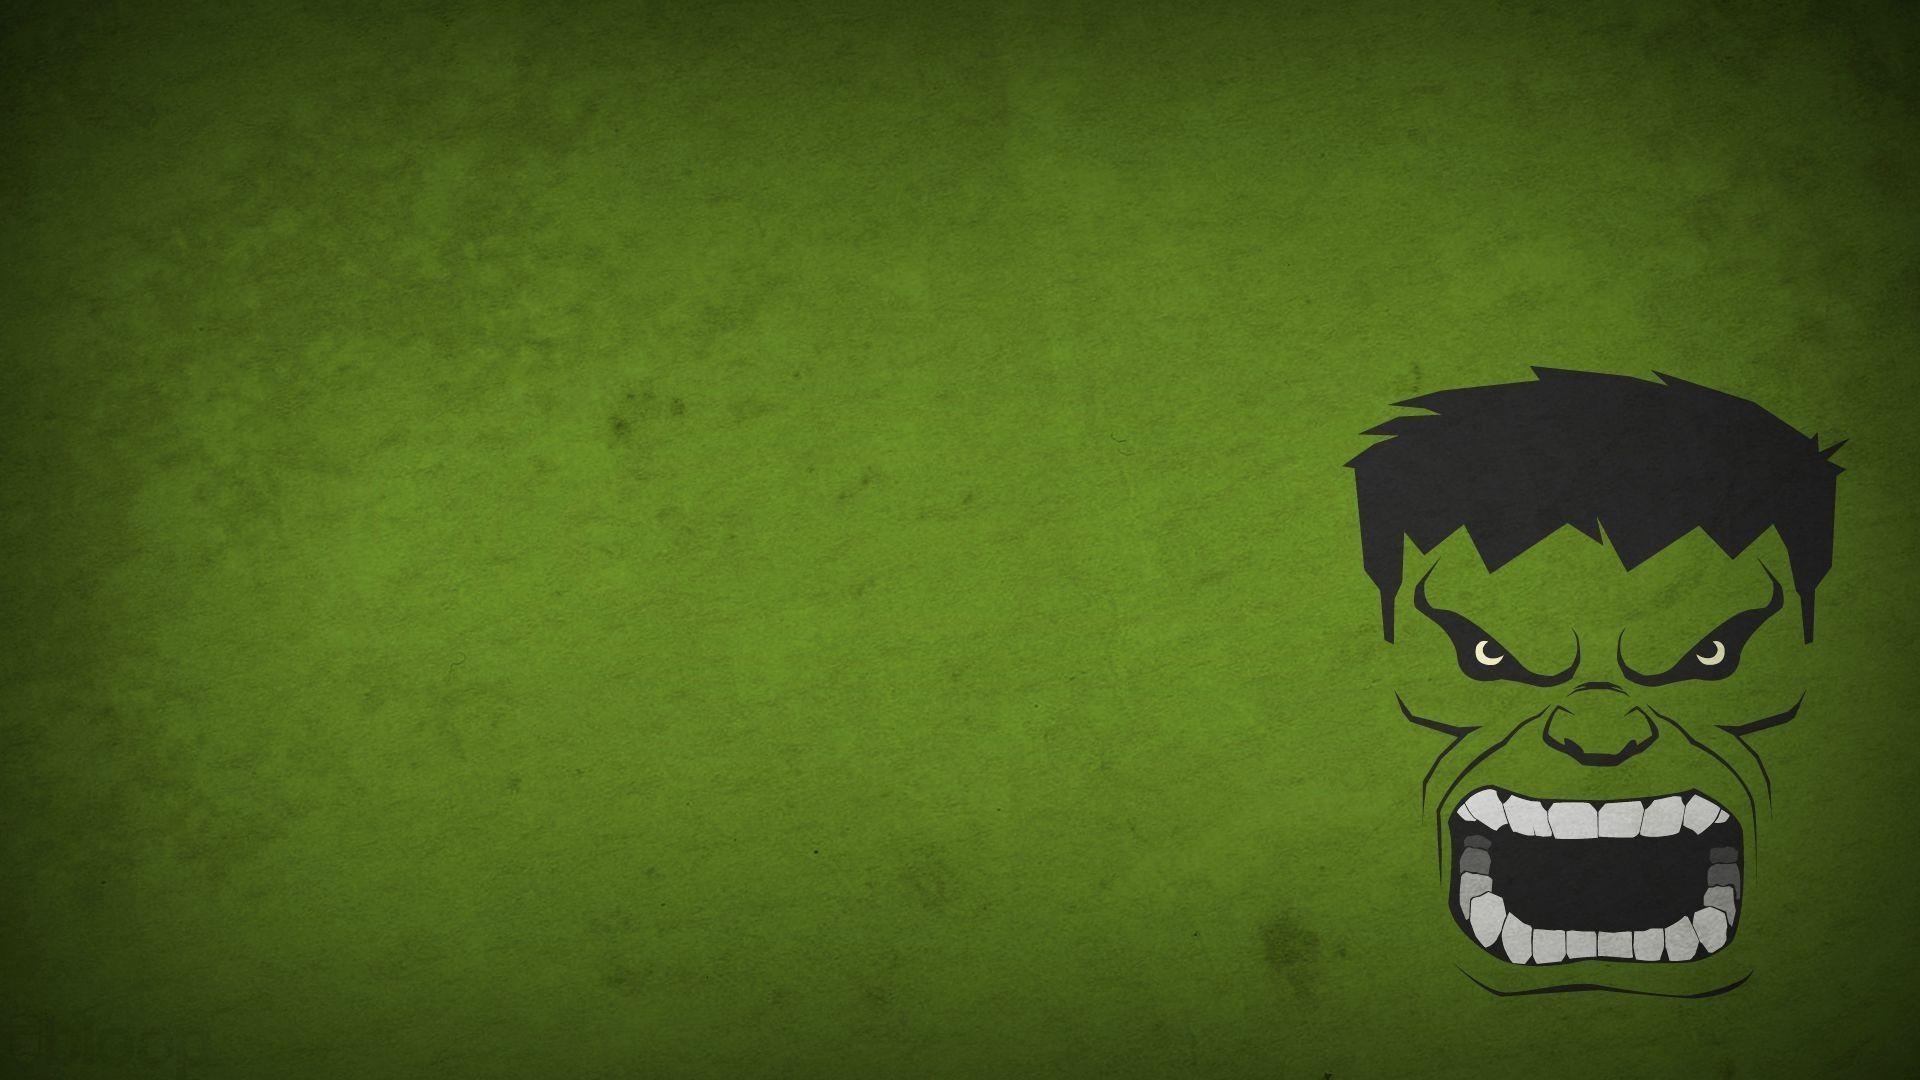 Fond D écran Dessin Noir Minimalisme Vert Super Héros